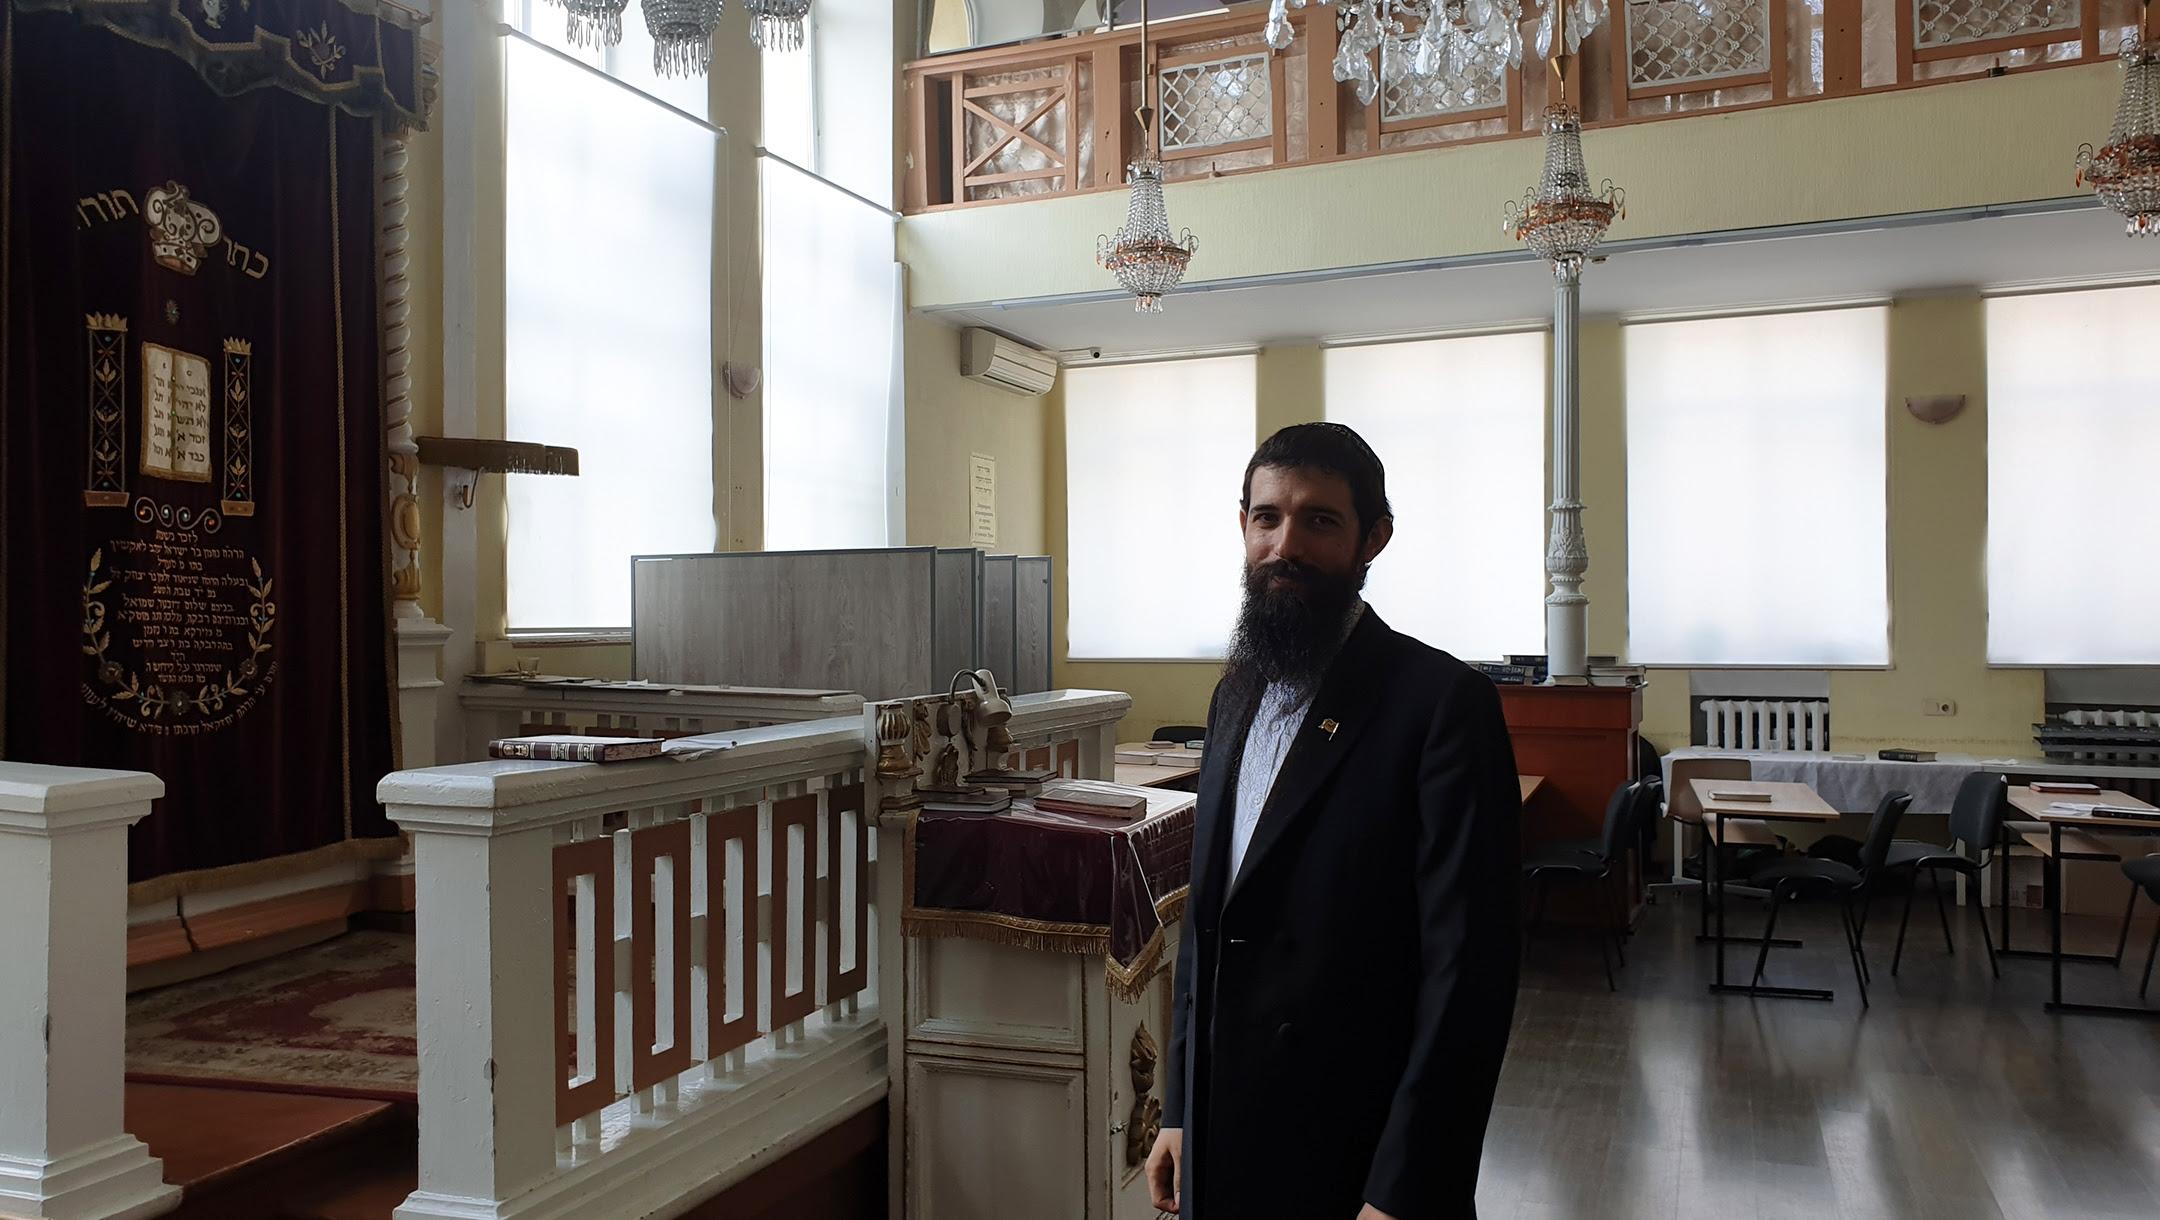 Rabbi Shmuel Zalmanov at the Alte Shul Synagogue on Chisinau, Moldova on Aug. 23, 2019. (Cnaan Liphshiz)